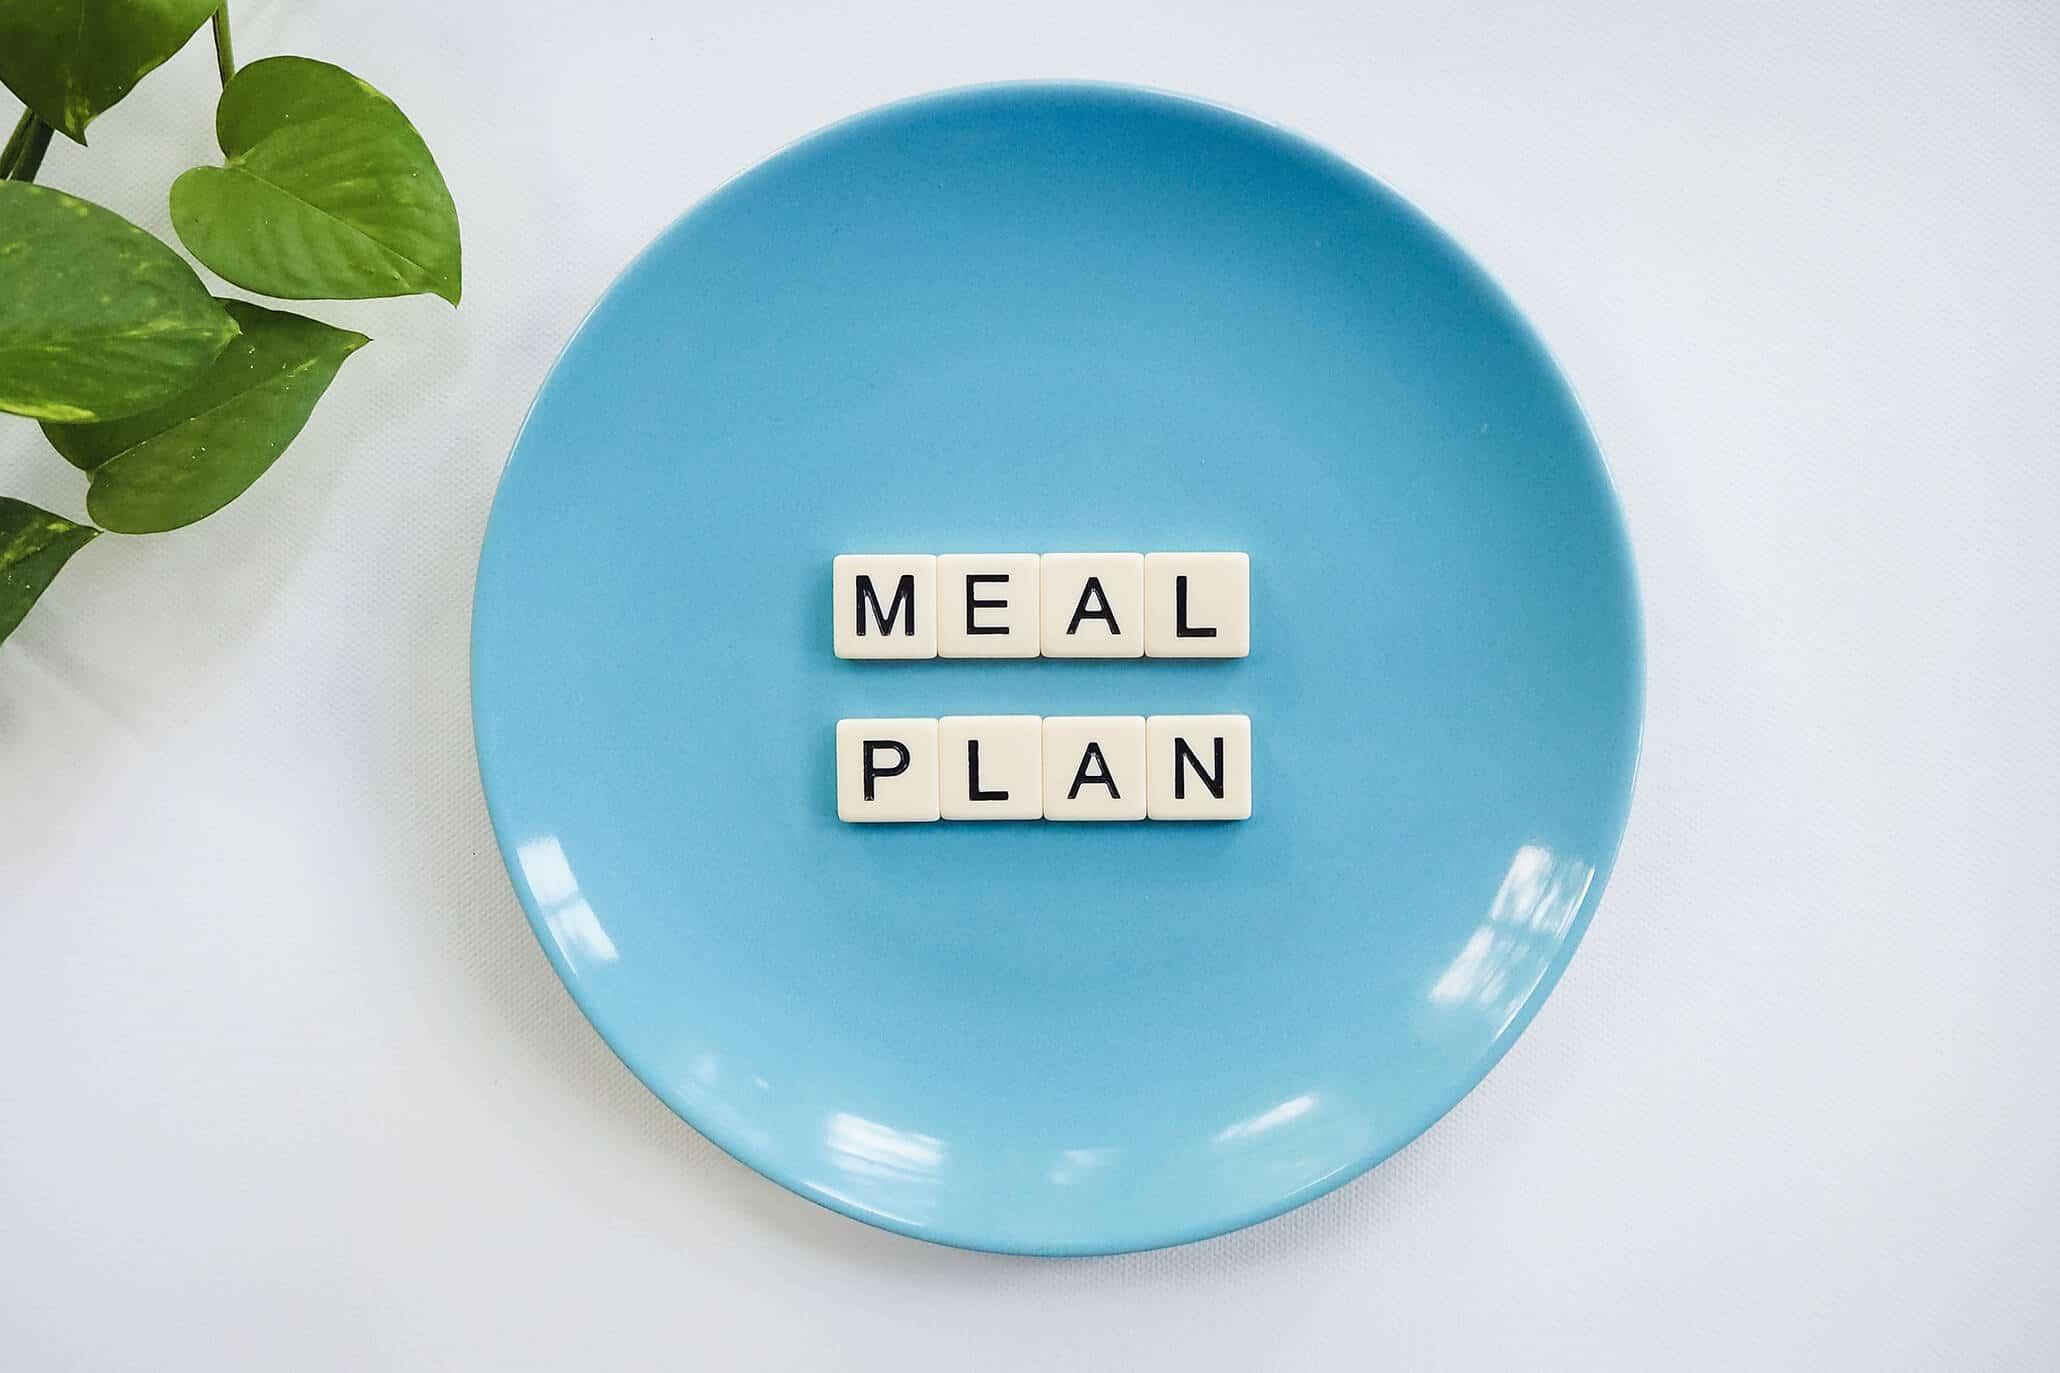 Abnehmen mit Plan